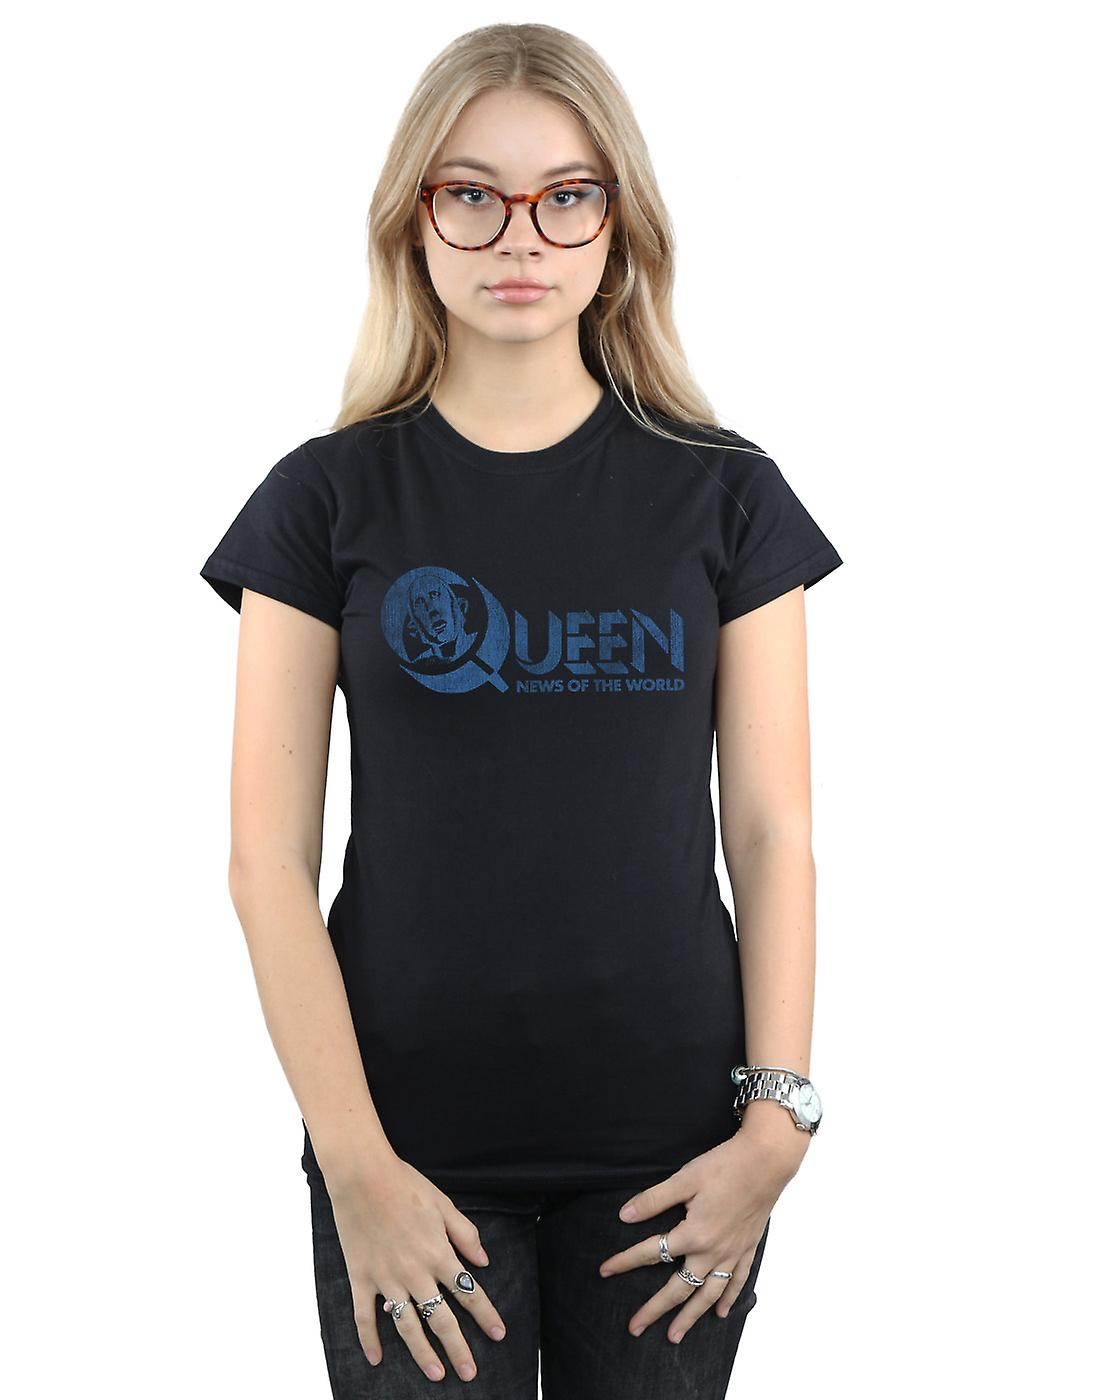 Queen Women's Distressed News Of The World T-Shirt